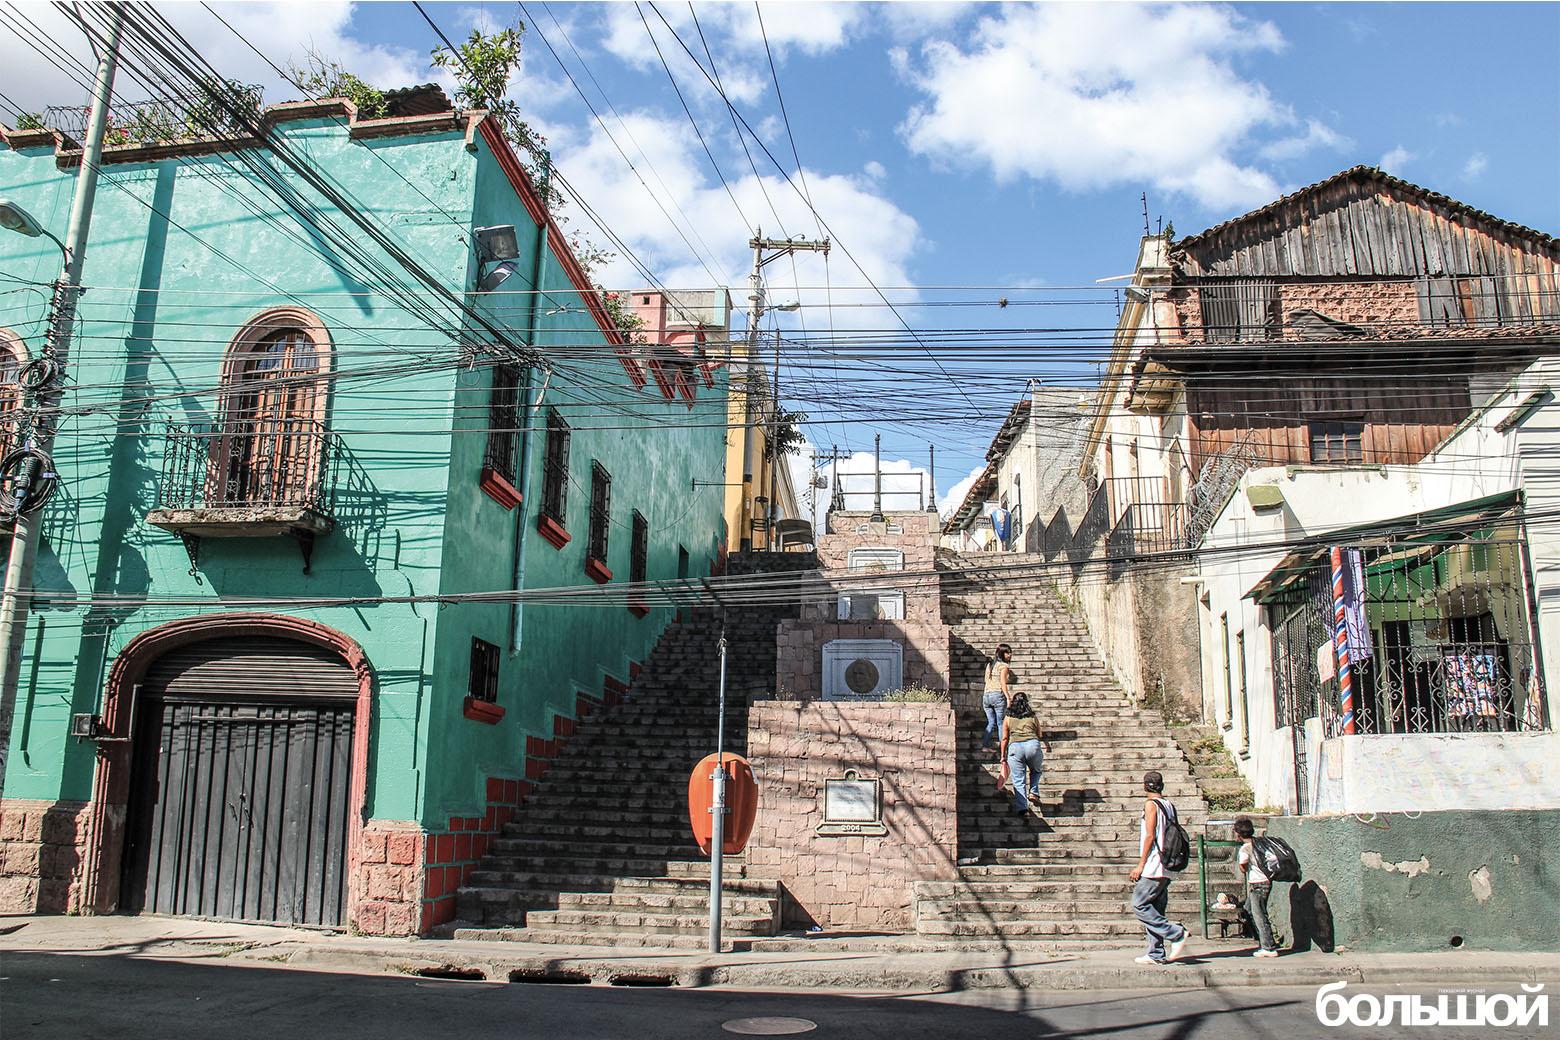 Гондурас is always a good idea